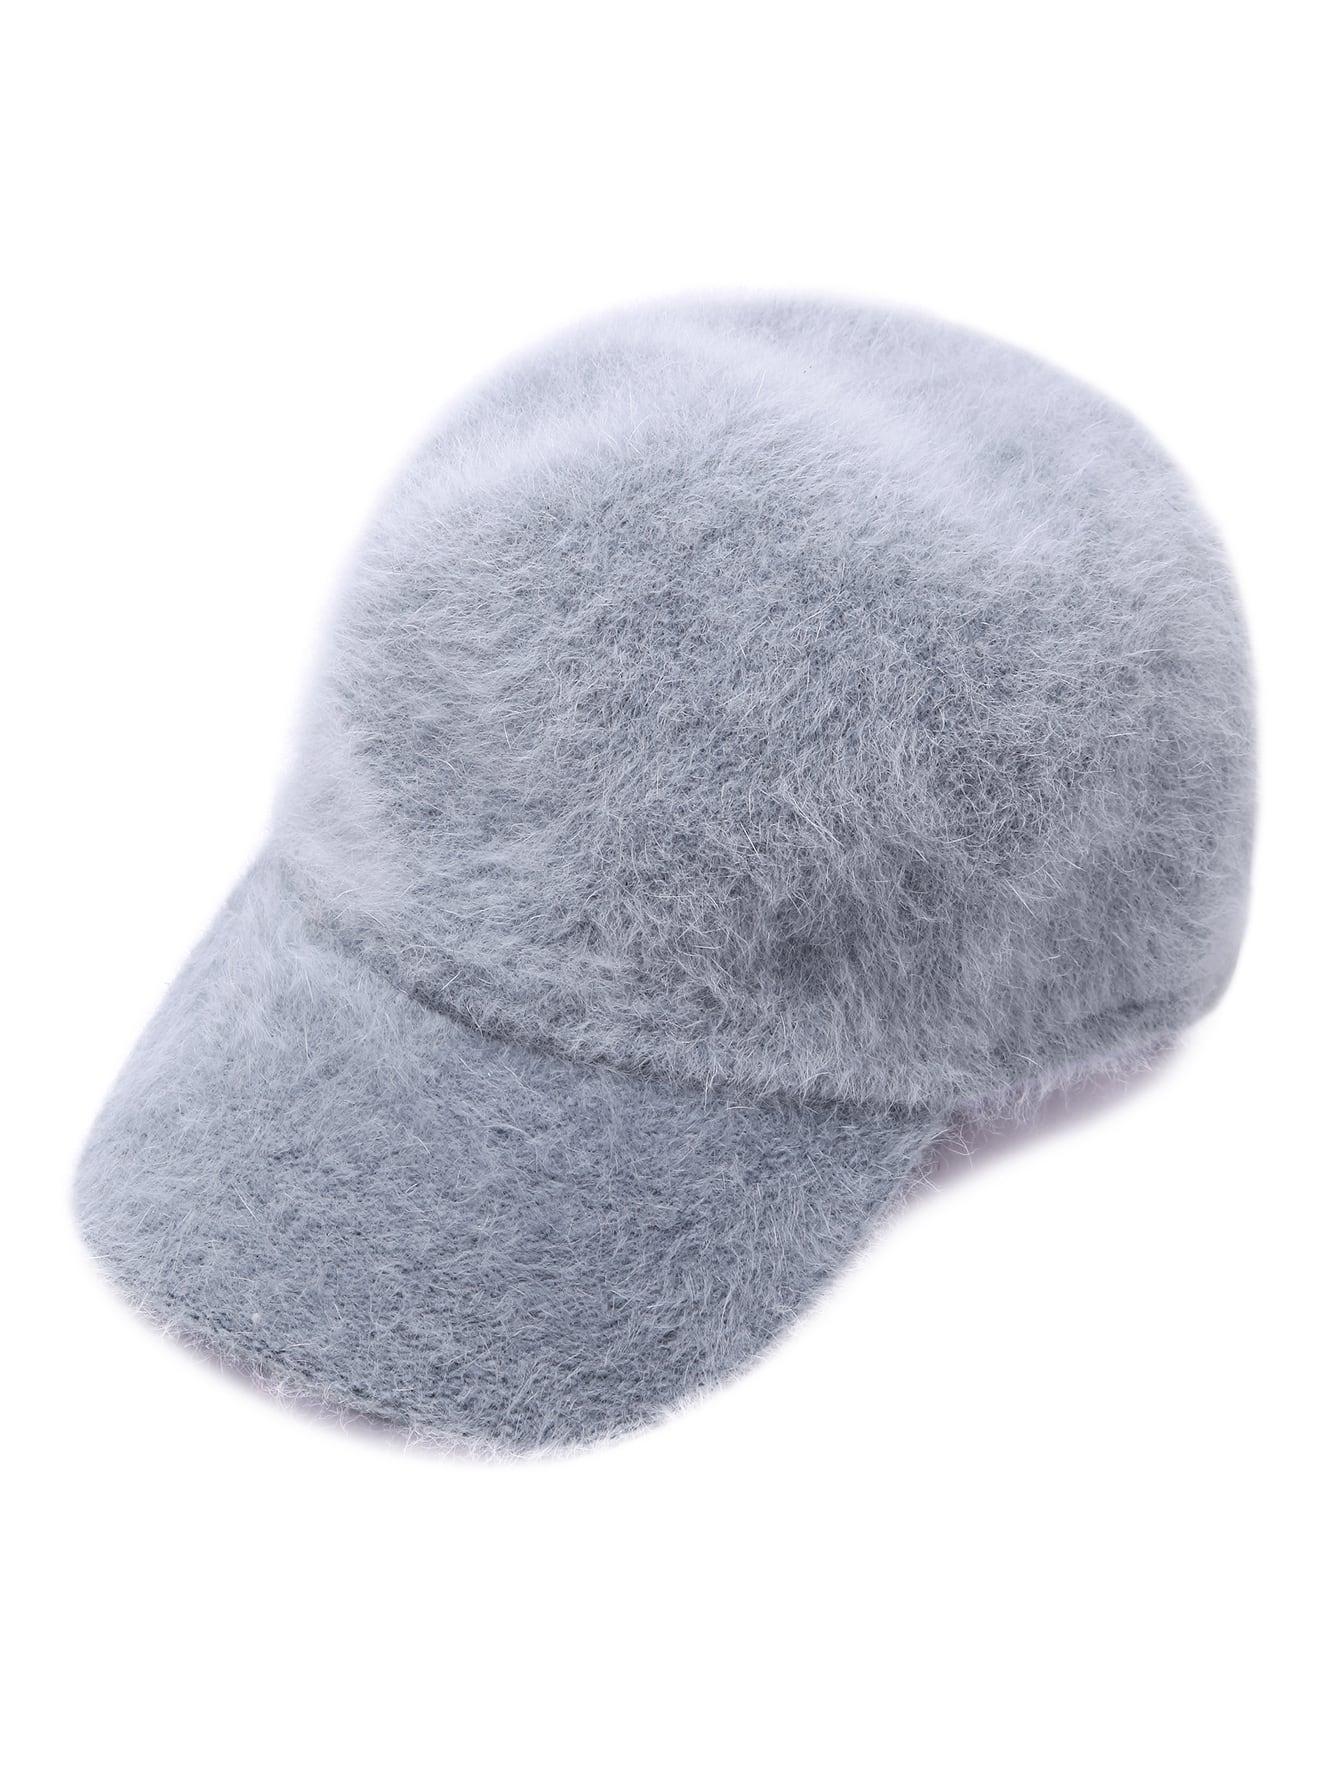 Light Grey Fuzzy Rabbit Hair CapLight Grey Fuzzy Rabbit Hair Cap<br><br>color: Grey<br>size: one-size